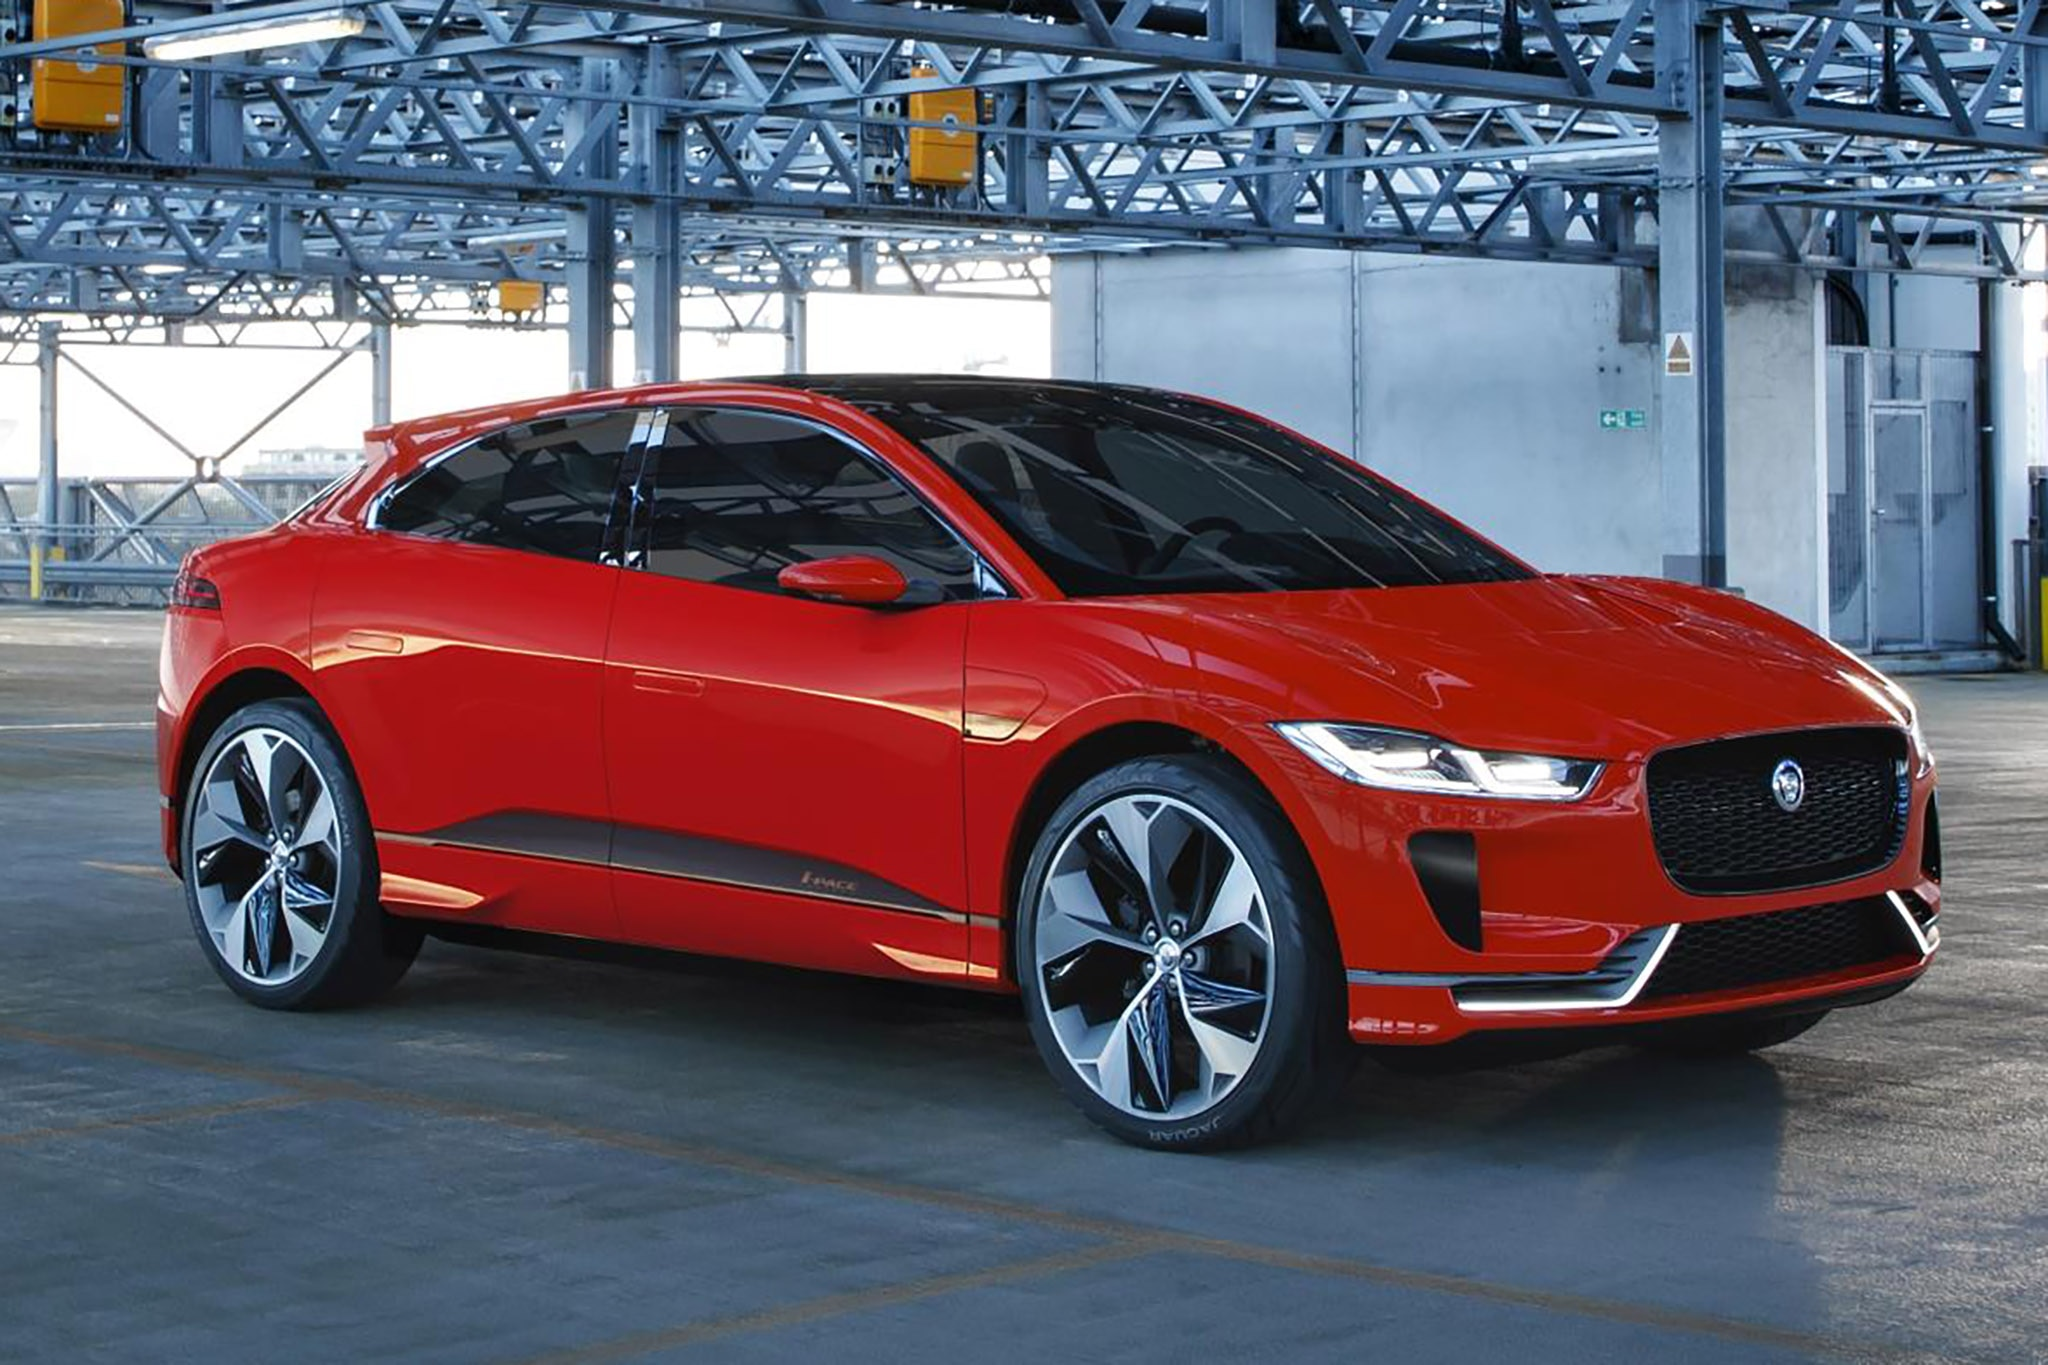 Jaguar I-Pace Concept Electrifies the Streets of London ...